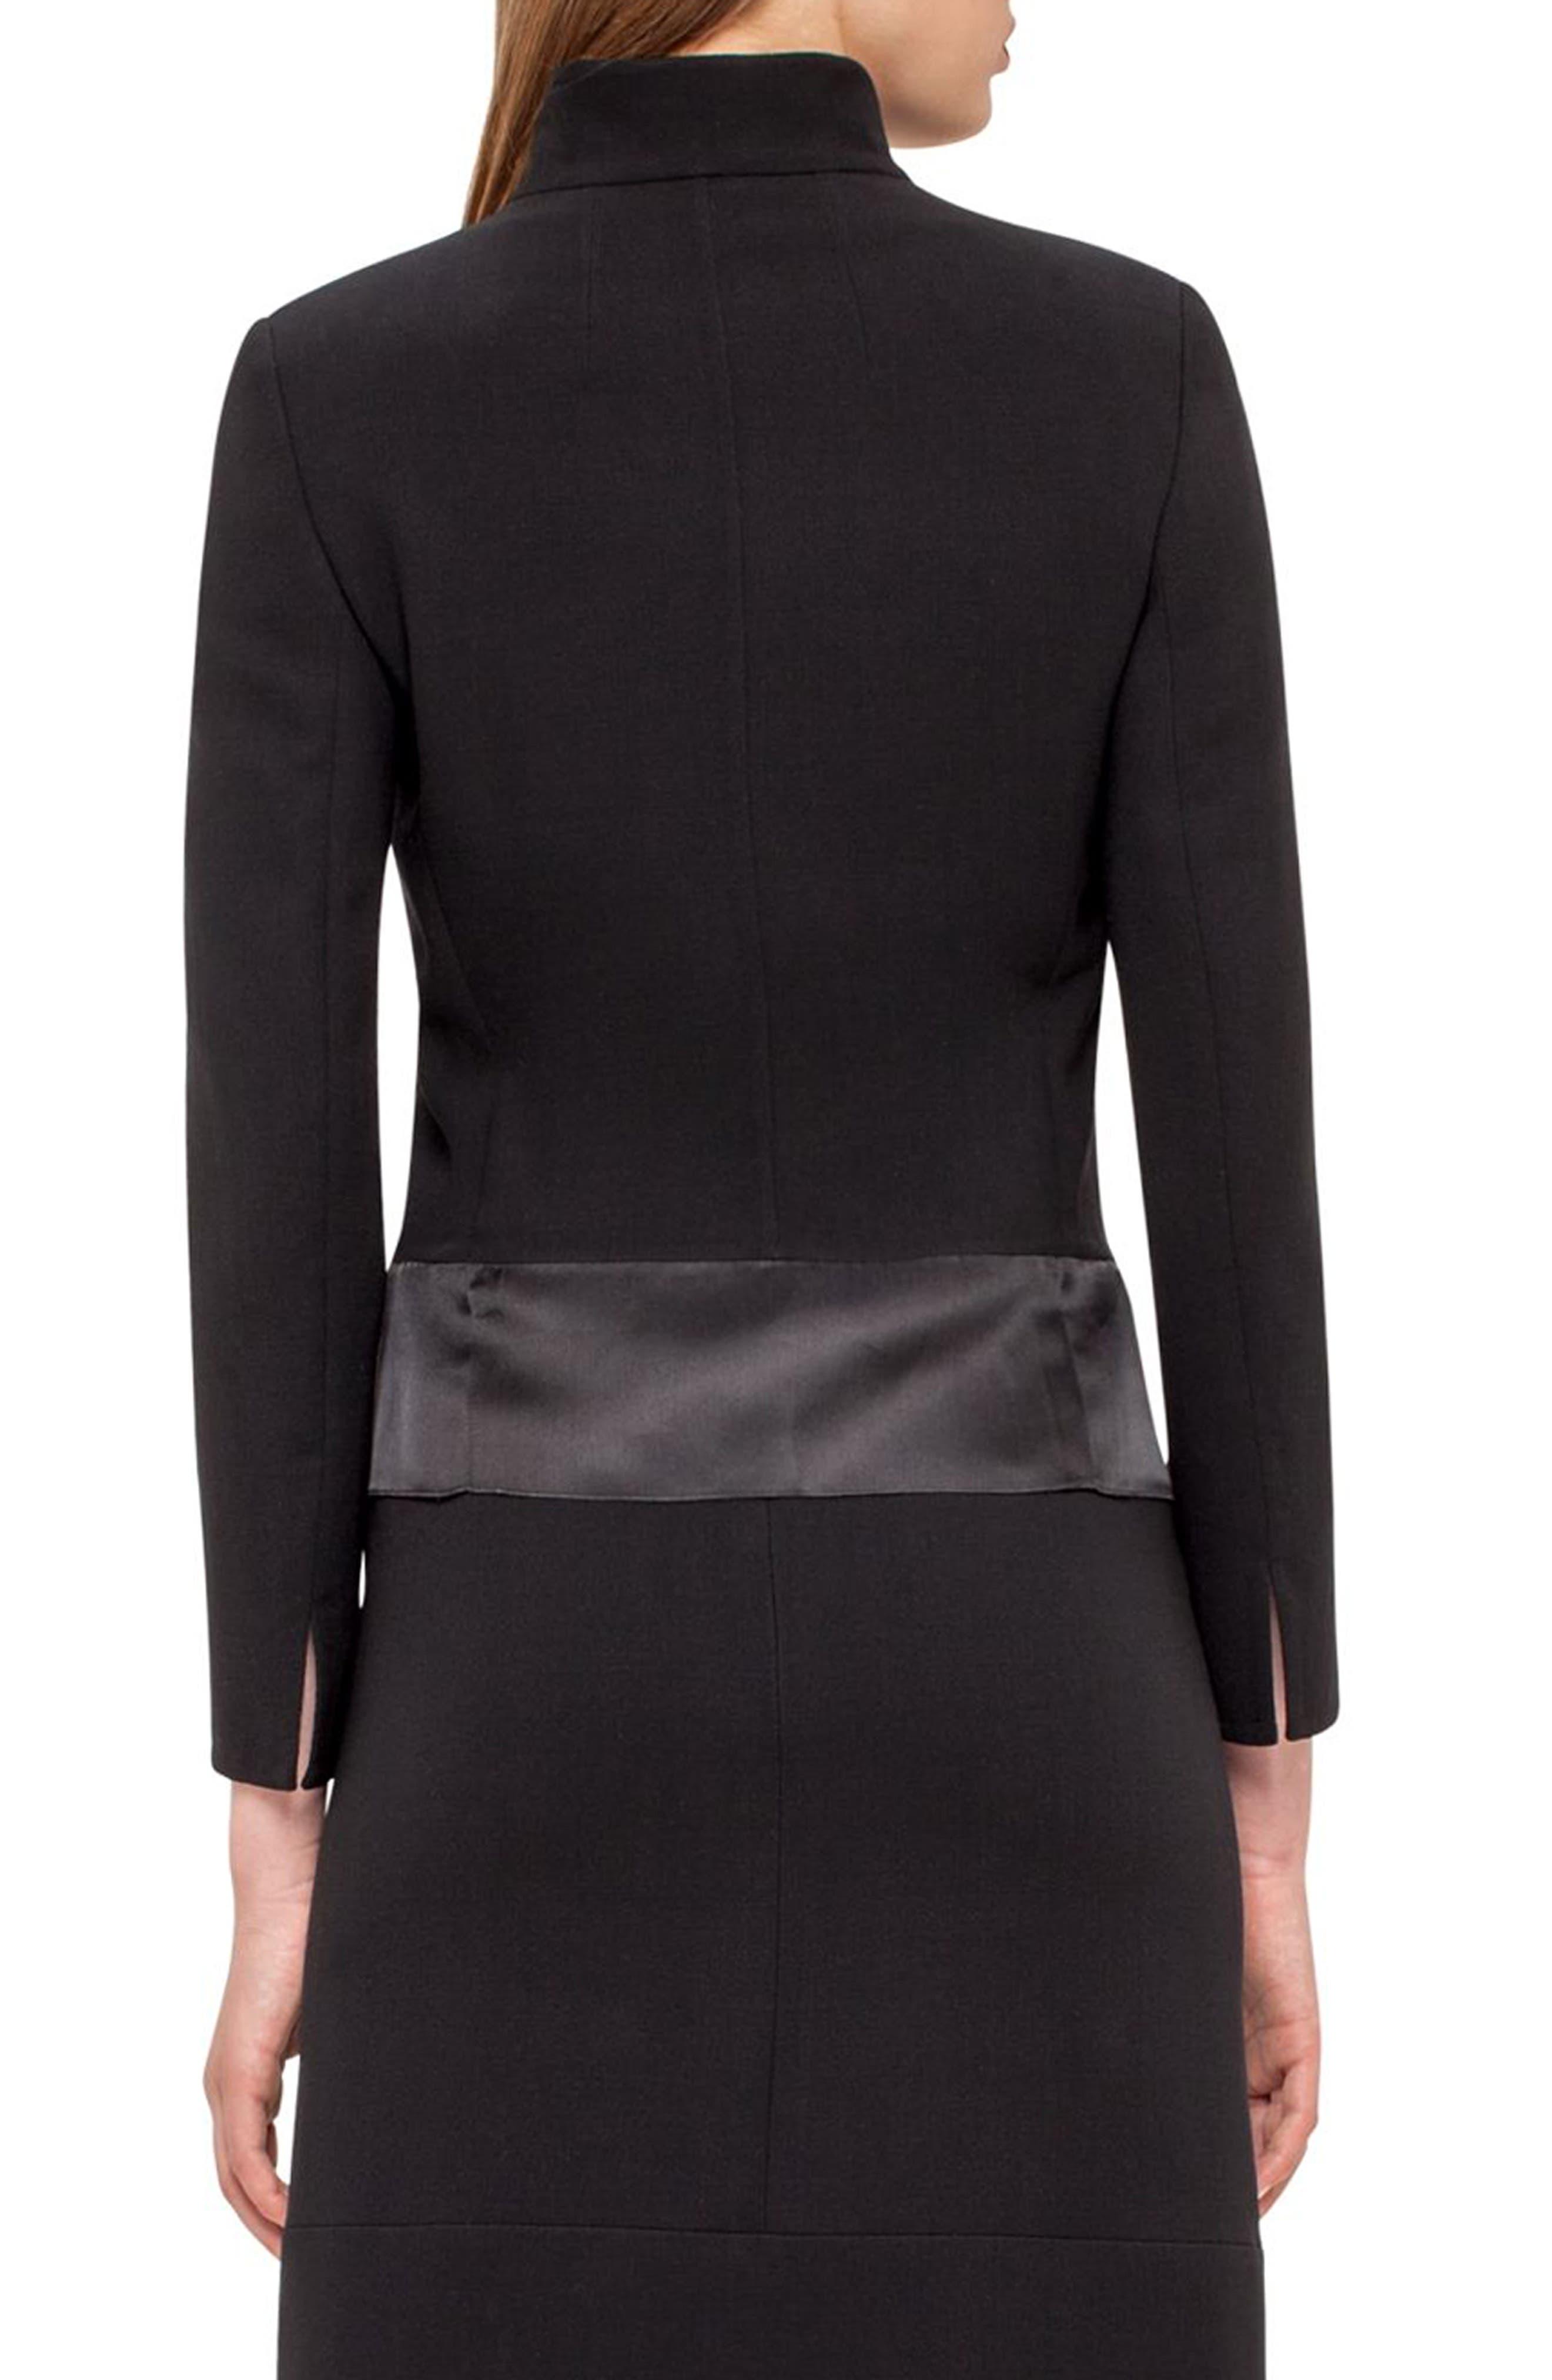 Ilke Double Face Wool Blend Jacket,                             Alternate thumbnail 6, color,                             BLACK